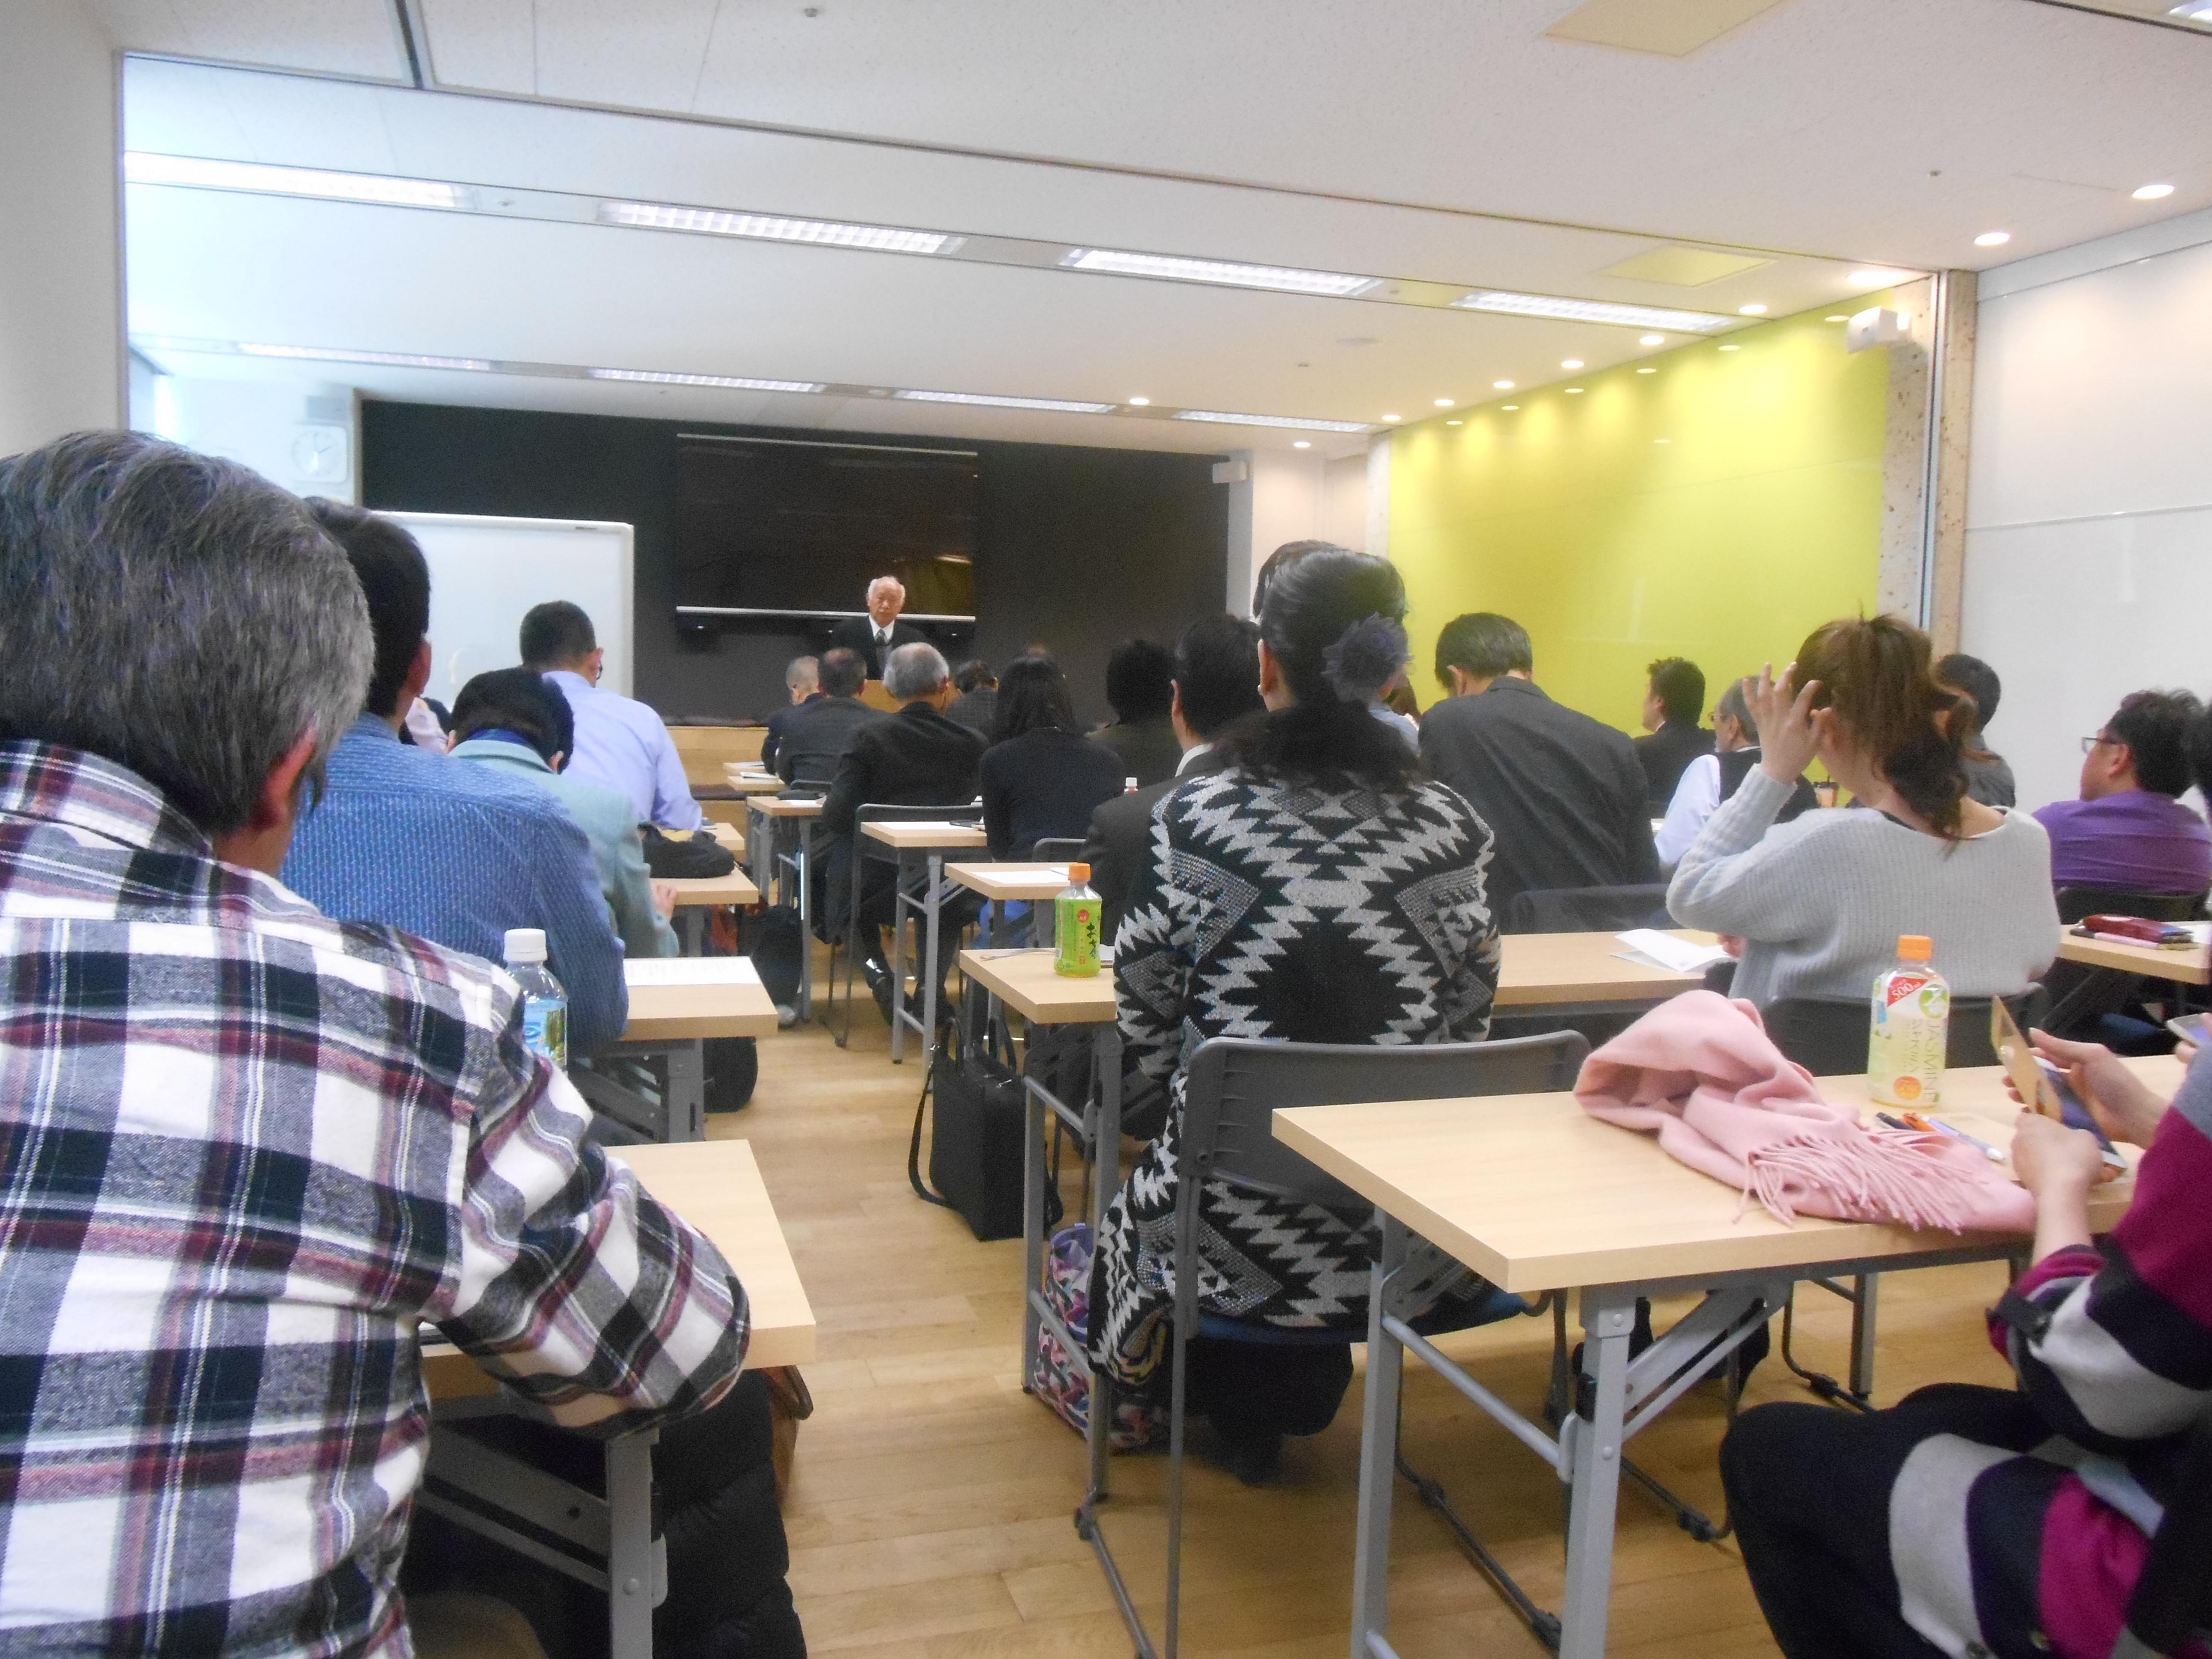 DSCN0052 - 4月1日東京思風塾の開催になります。